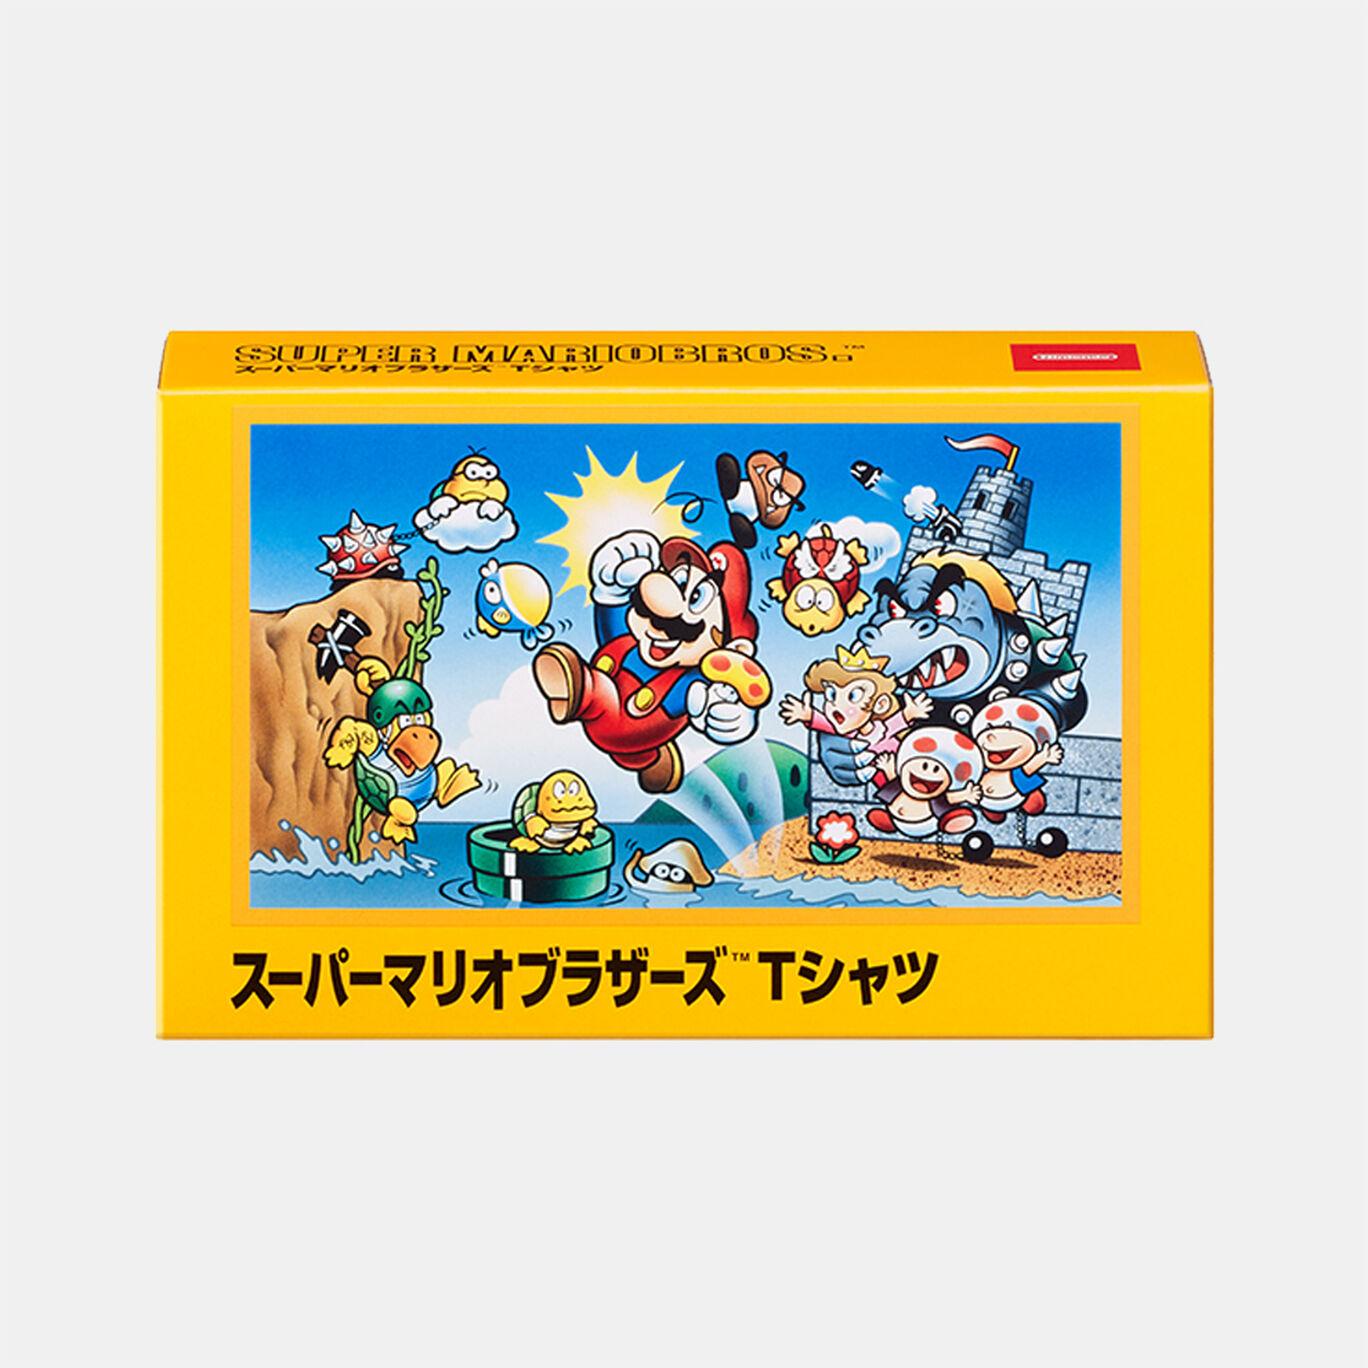 Tシャツ スーパーマリオブラザーズ S【Nintendo TOKYO取り扱い商品】